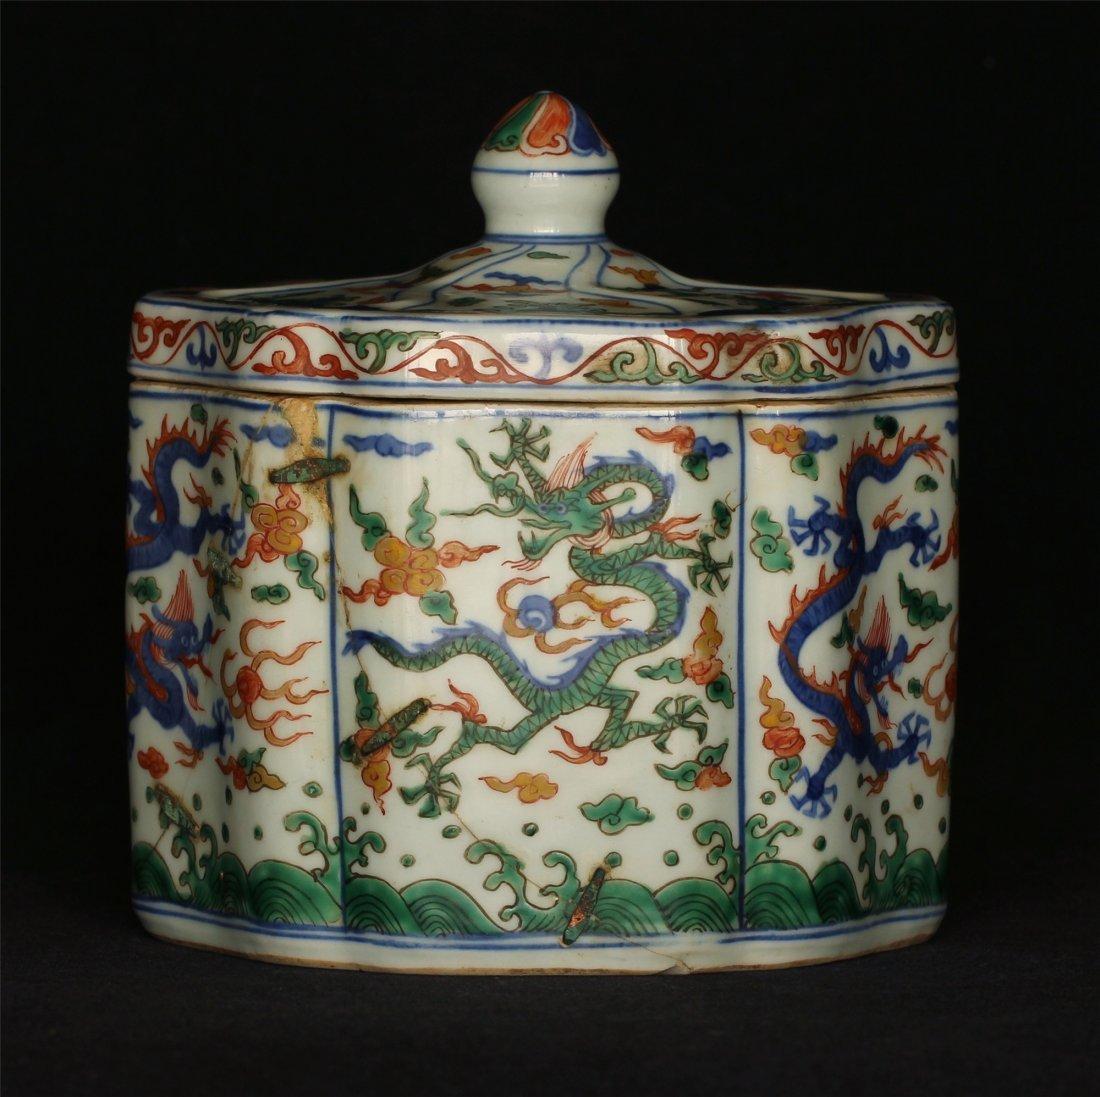 Blue and white & color porcelain jar of Ming Dynasty